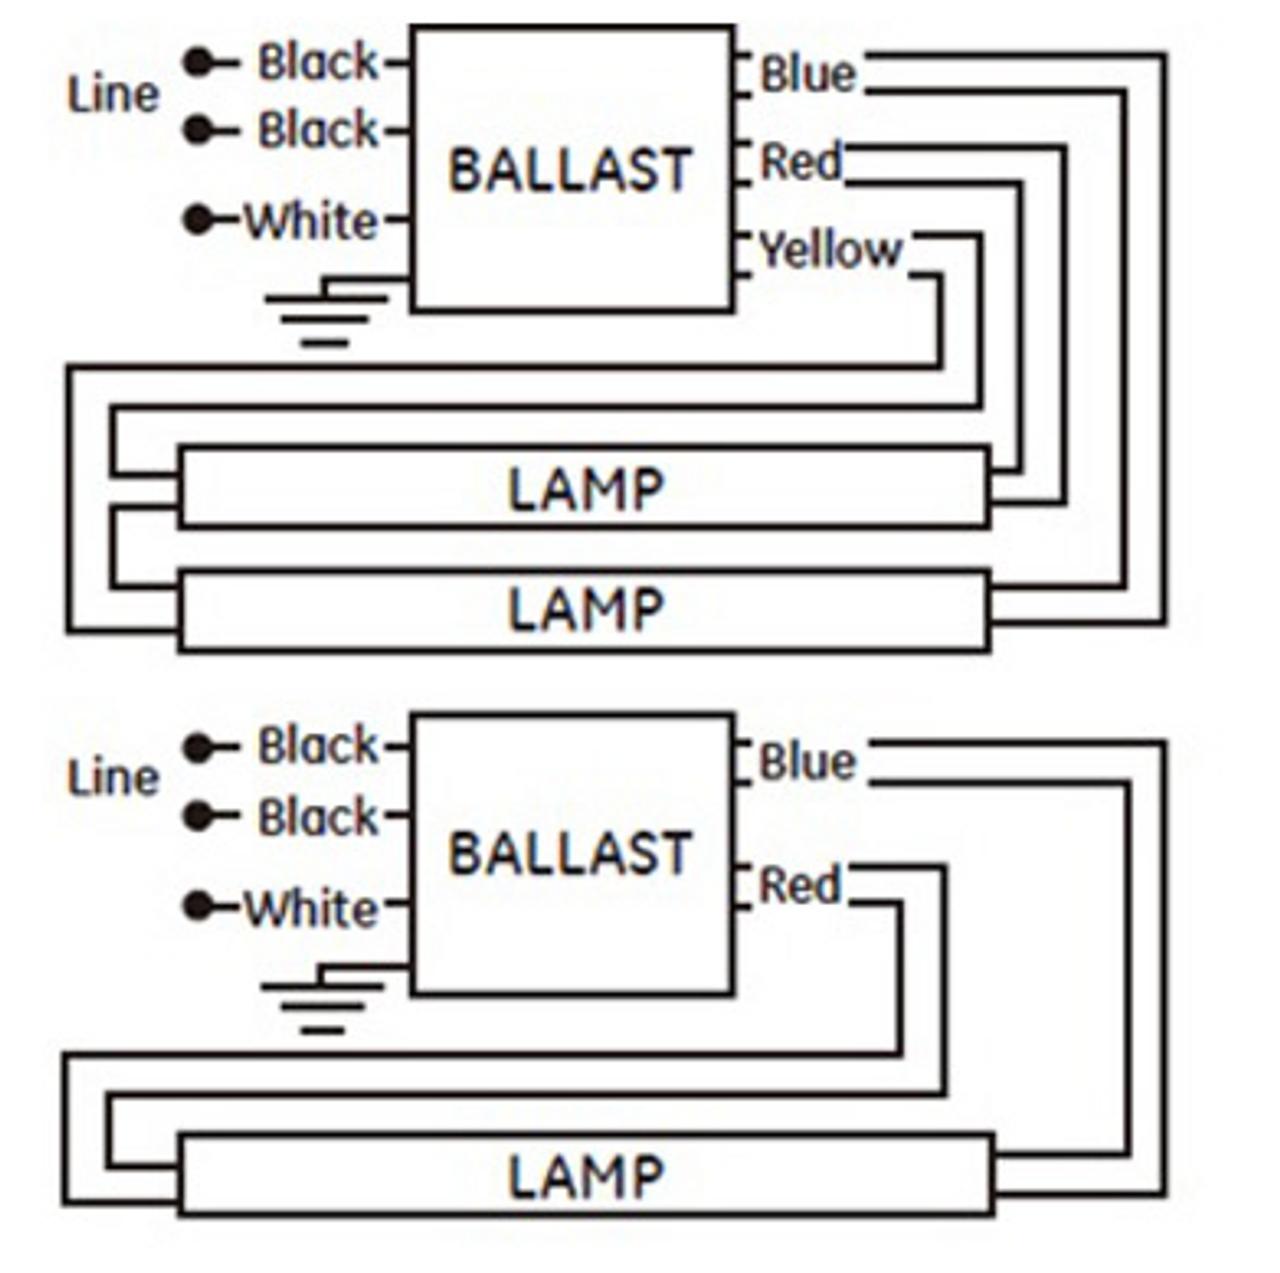 GE224MVPS-S35 GE 90904 | Step Dimming Ballast | Ge Stepped Dimming Ballast Wiring Diagram |  | BallastShop.com